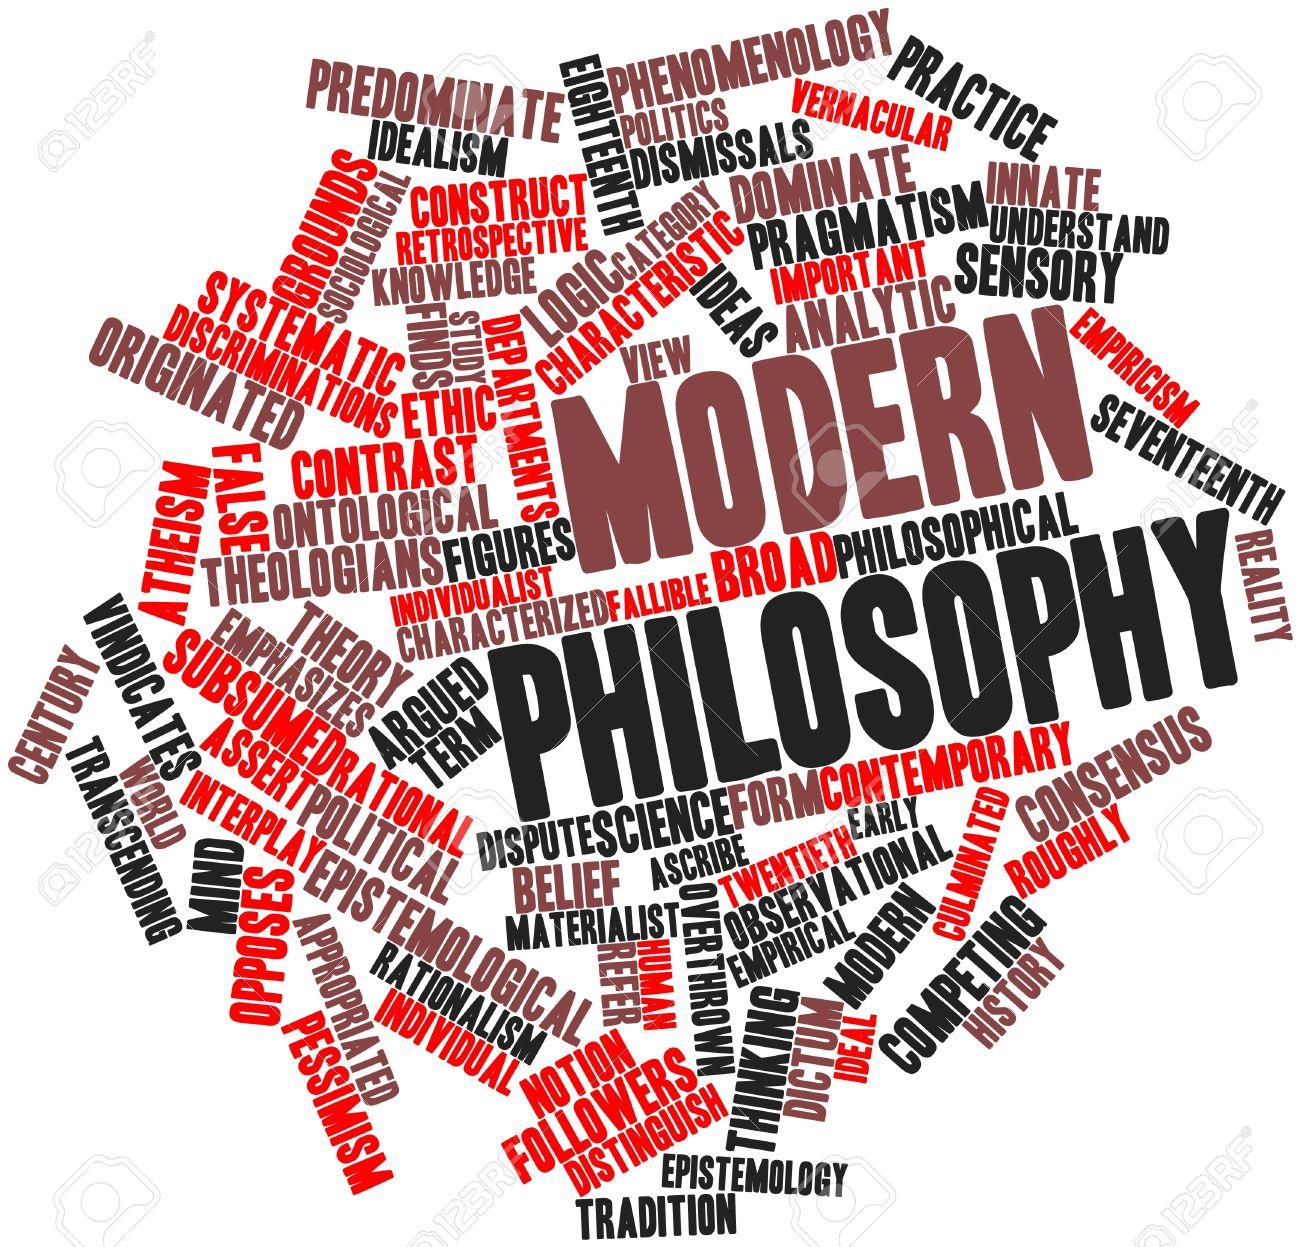 Popular Modern Philosophy Books